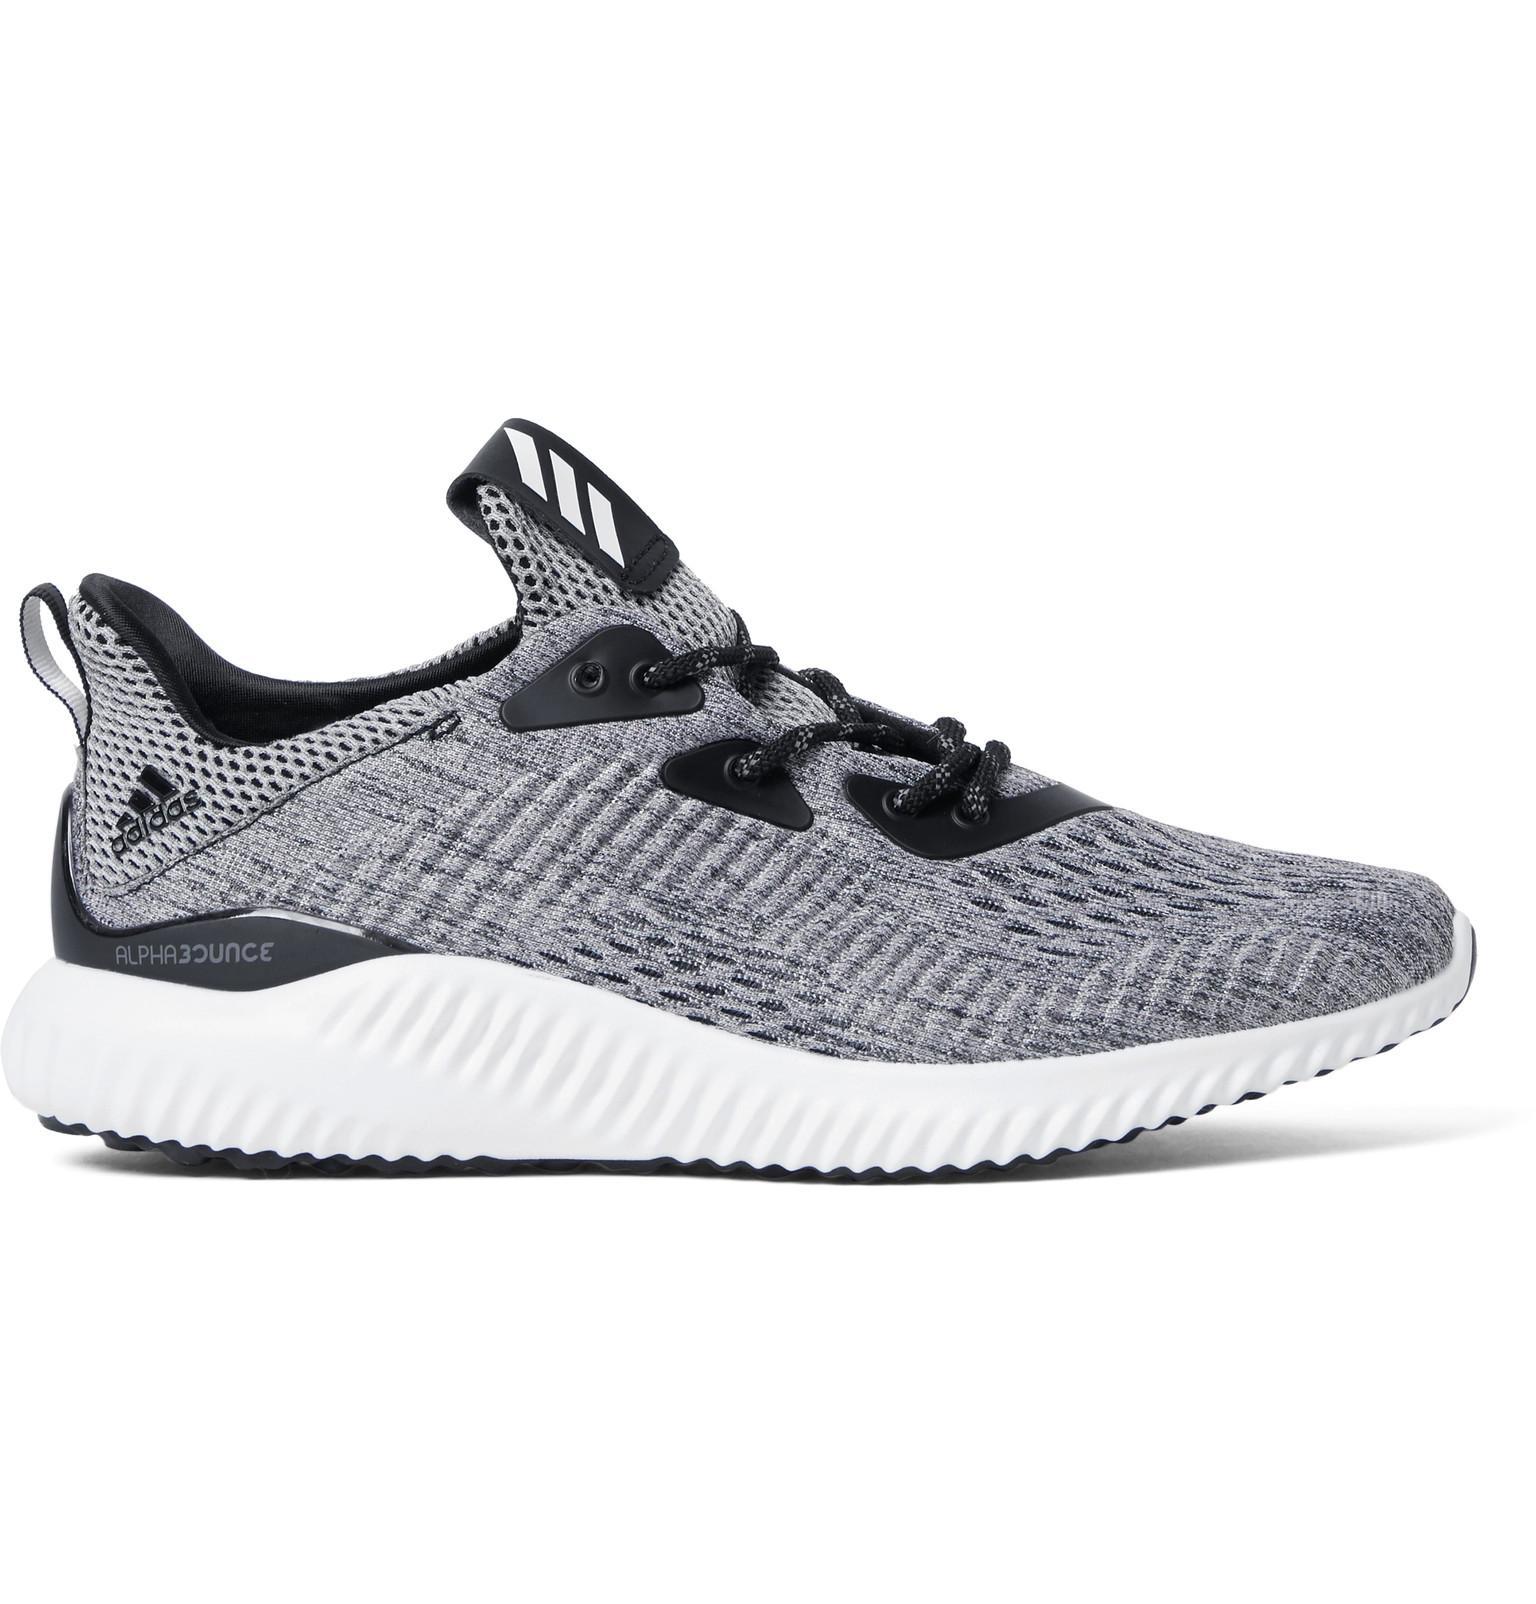 Adidas Originals Alphabounce Mesh Sneakers In Gray For Men